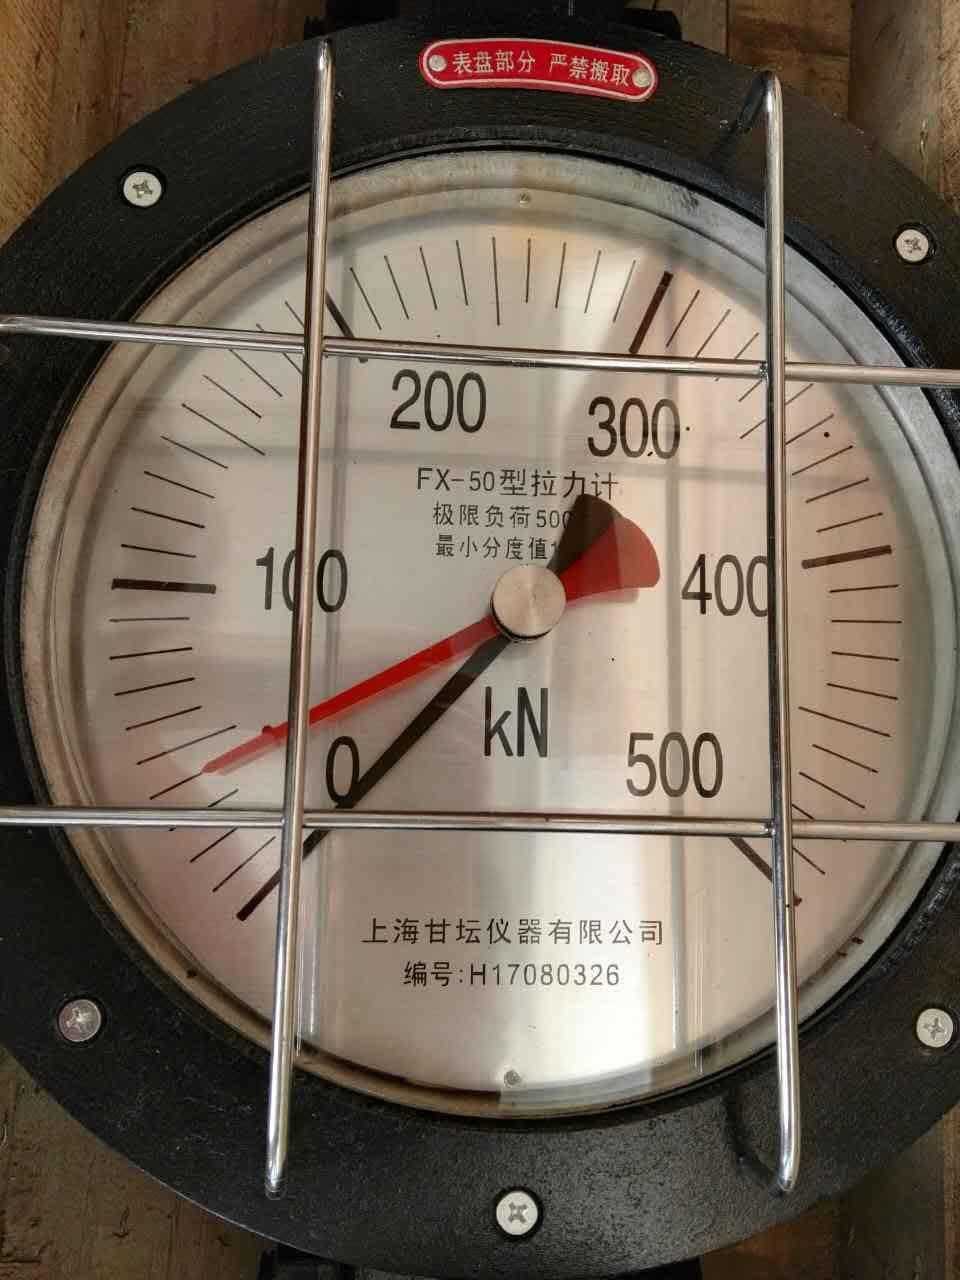 500KN 50吨表盘式拉力计.修井机用指针读取测力仪